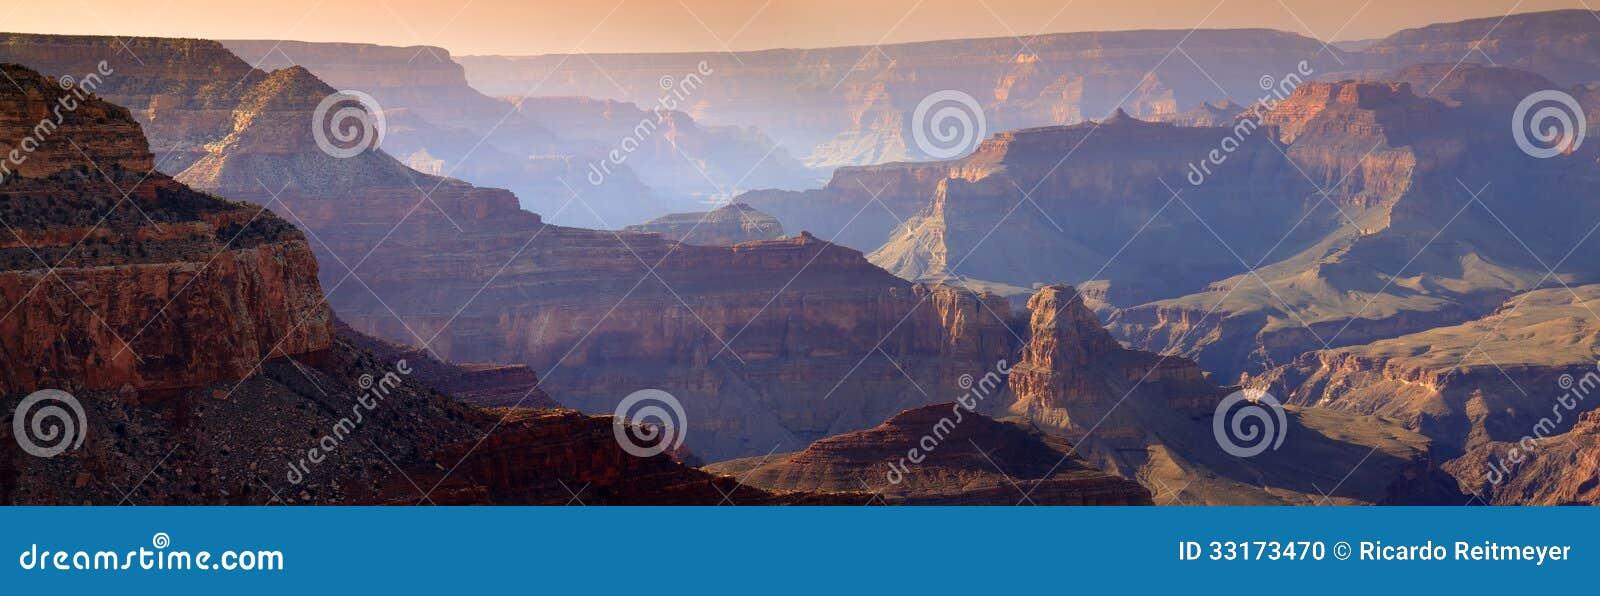 Majestueus Zonsondergangzuiden Rim Grand Canyon National Park Arizona